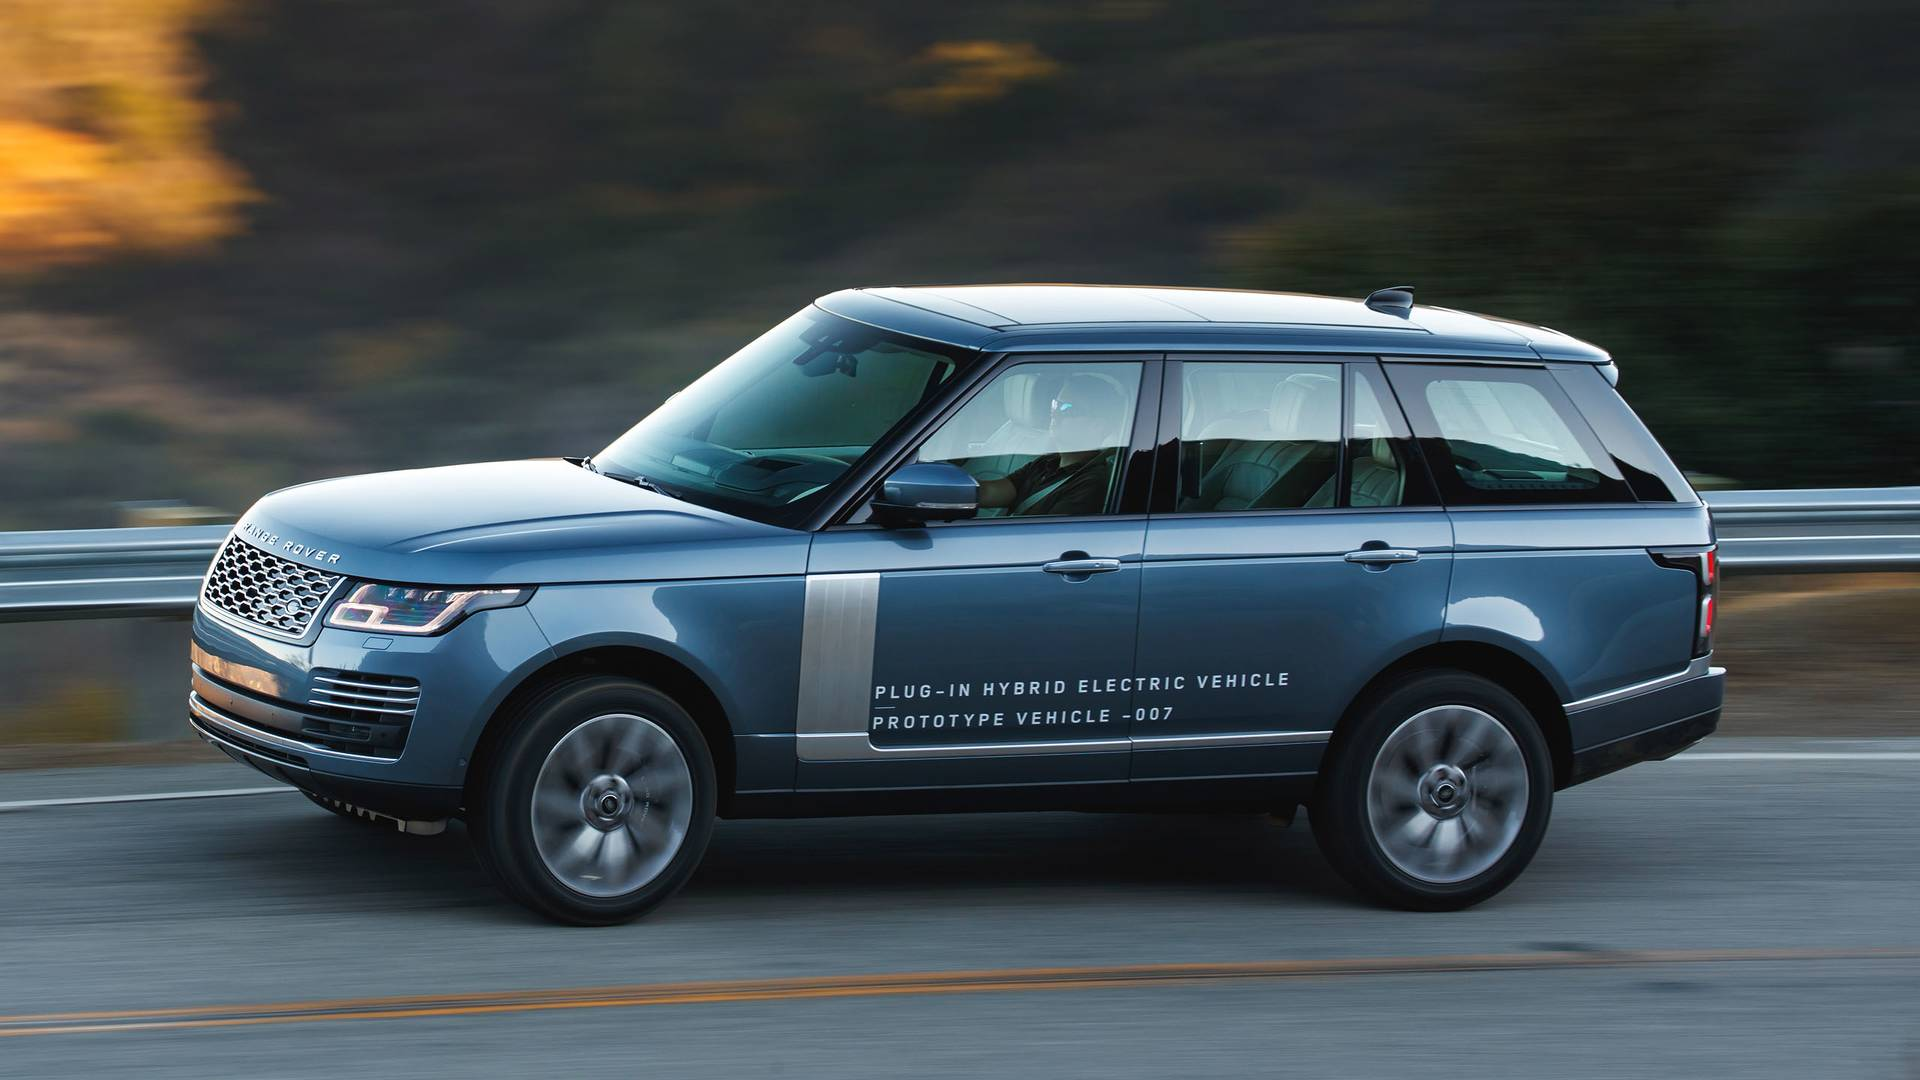 2019 Land Rover Range Rover P400e First Drive Never Stop Exploring